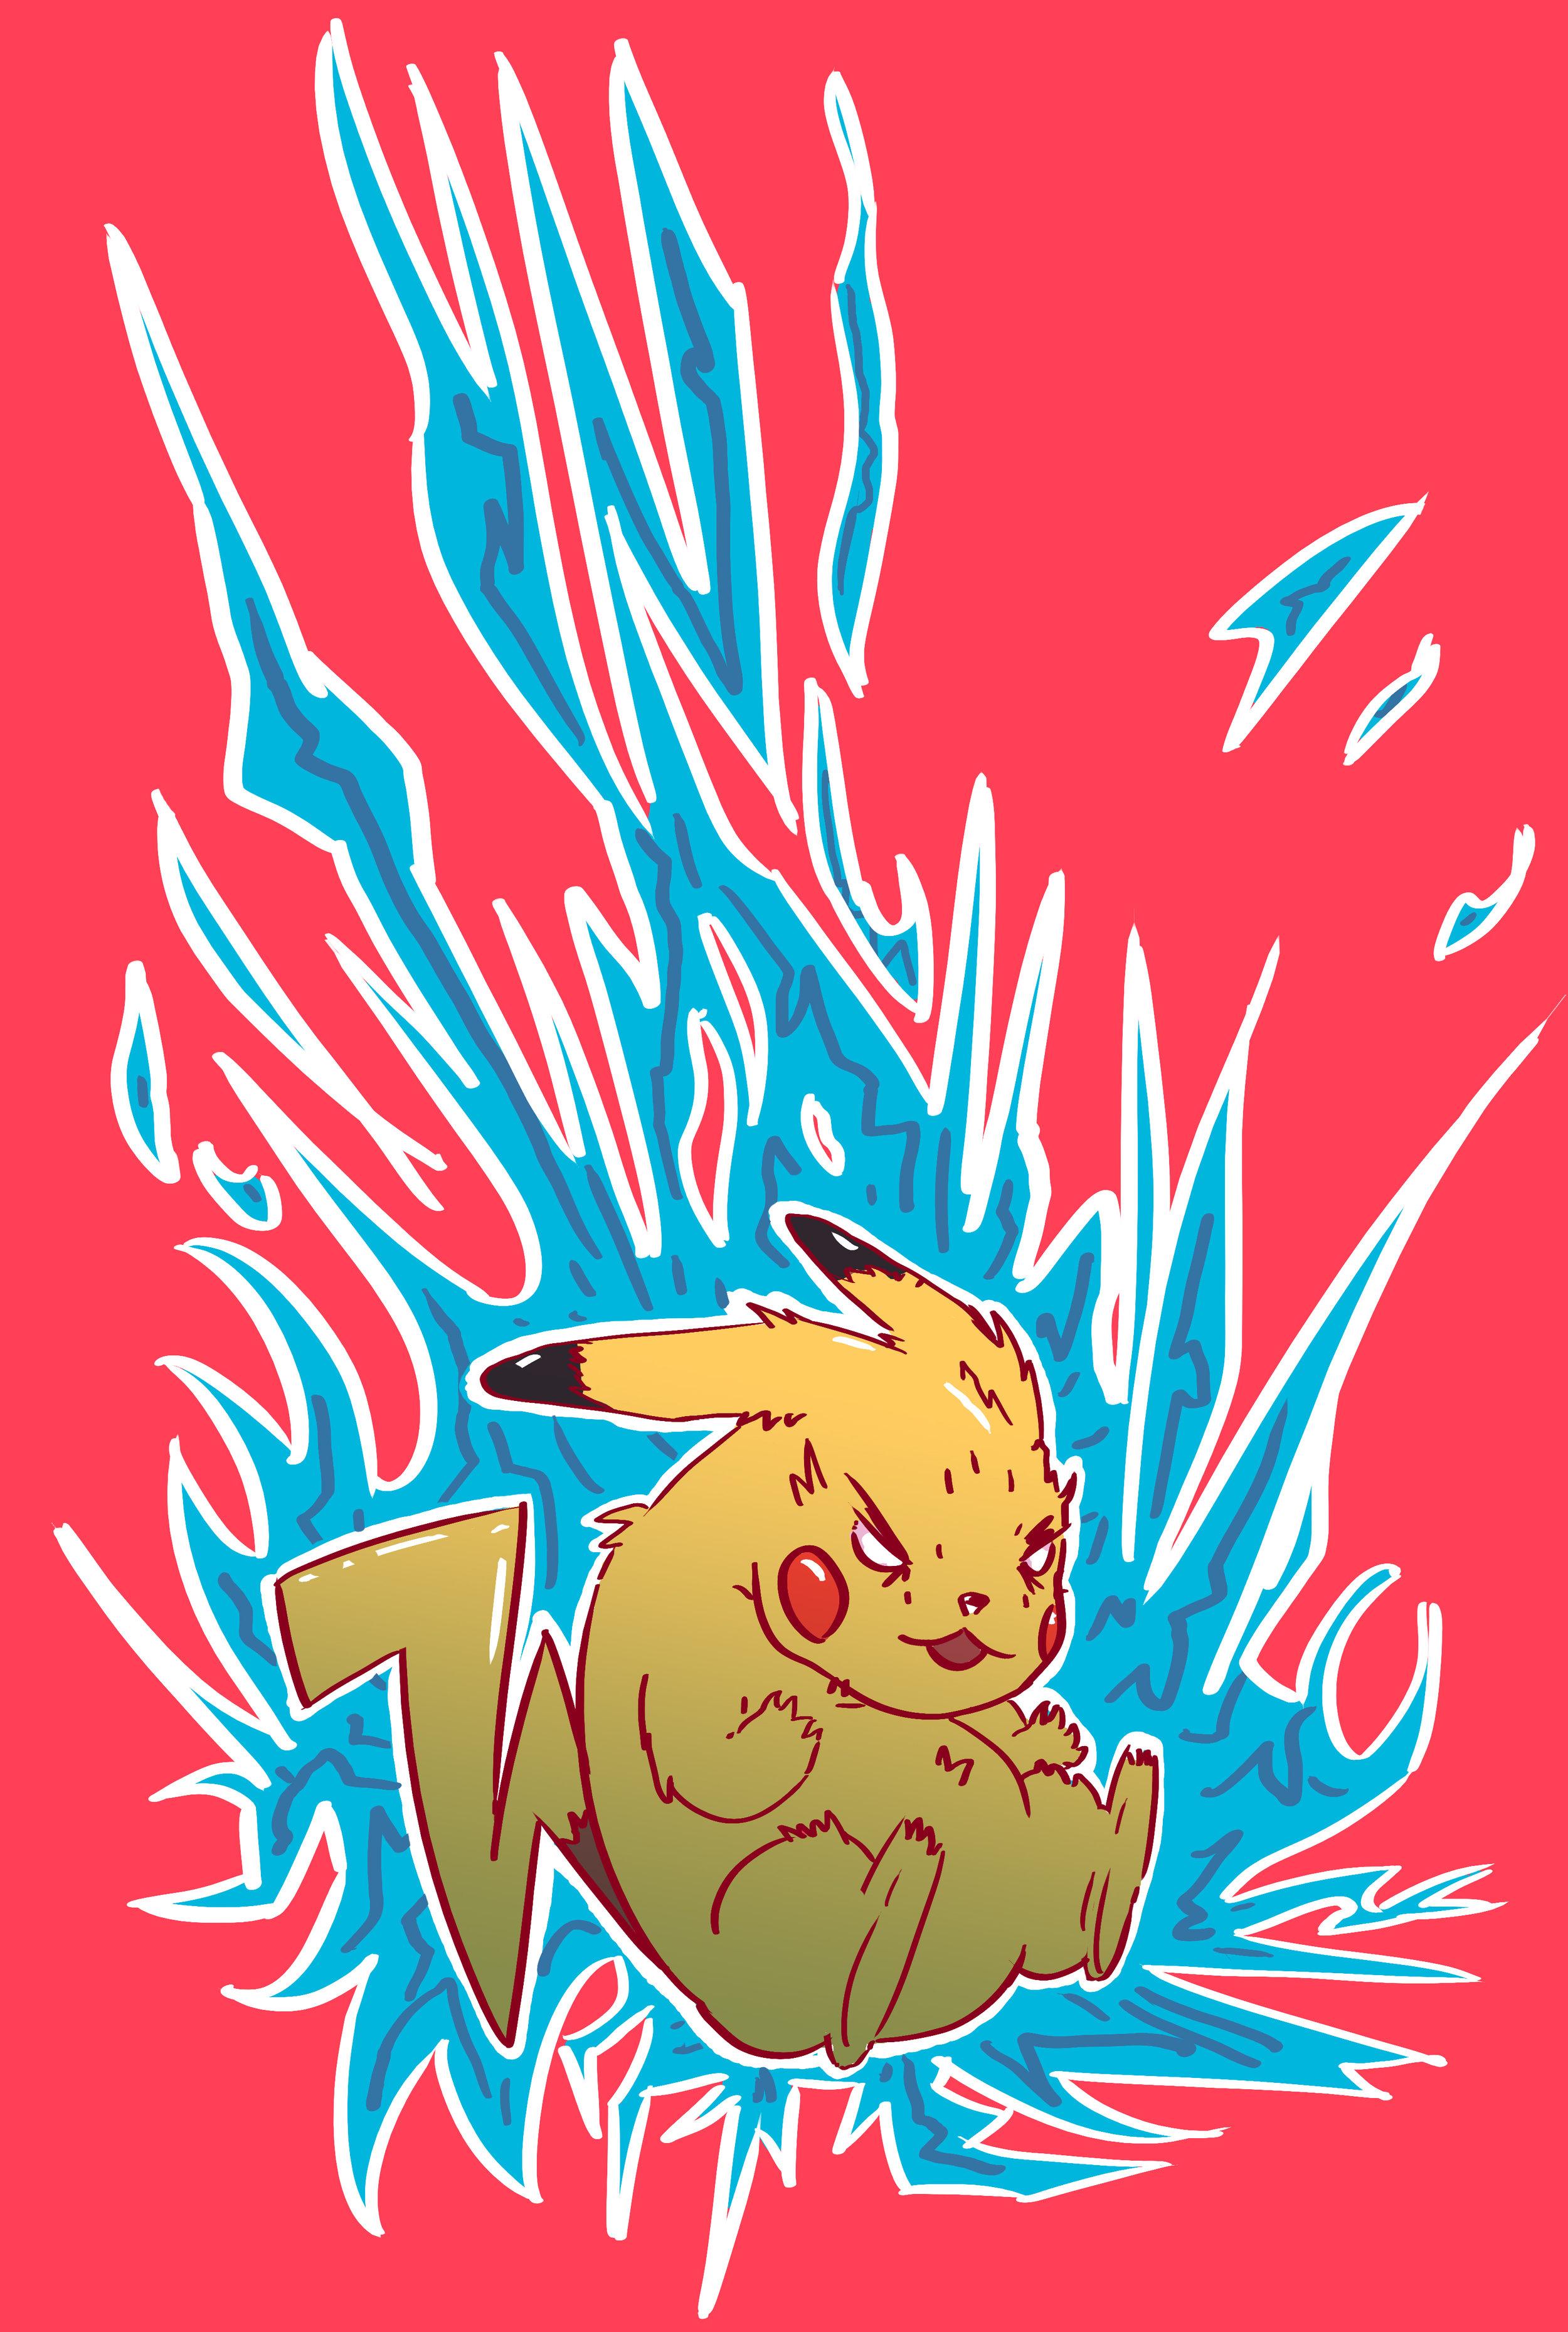 Pikachu - Thunder